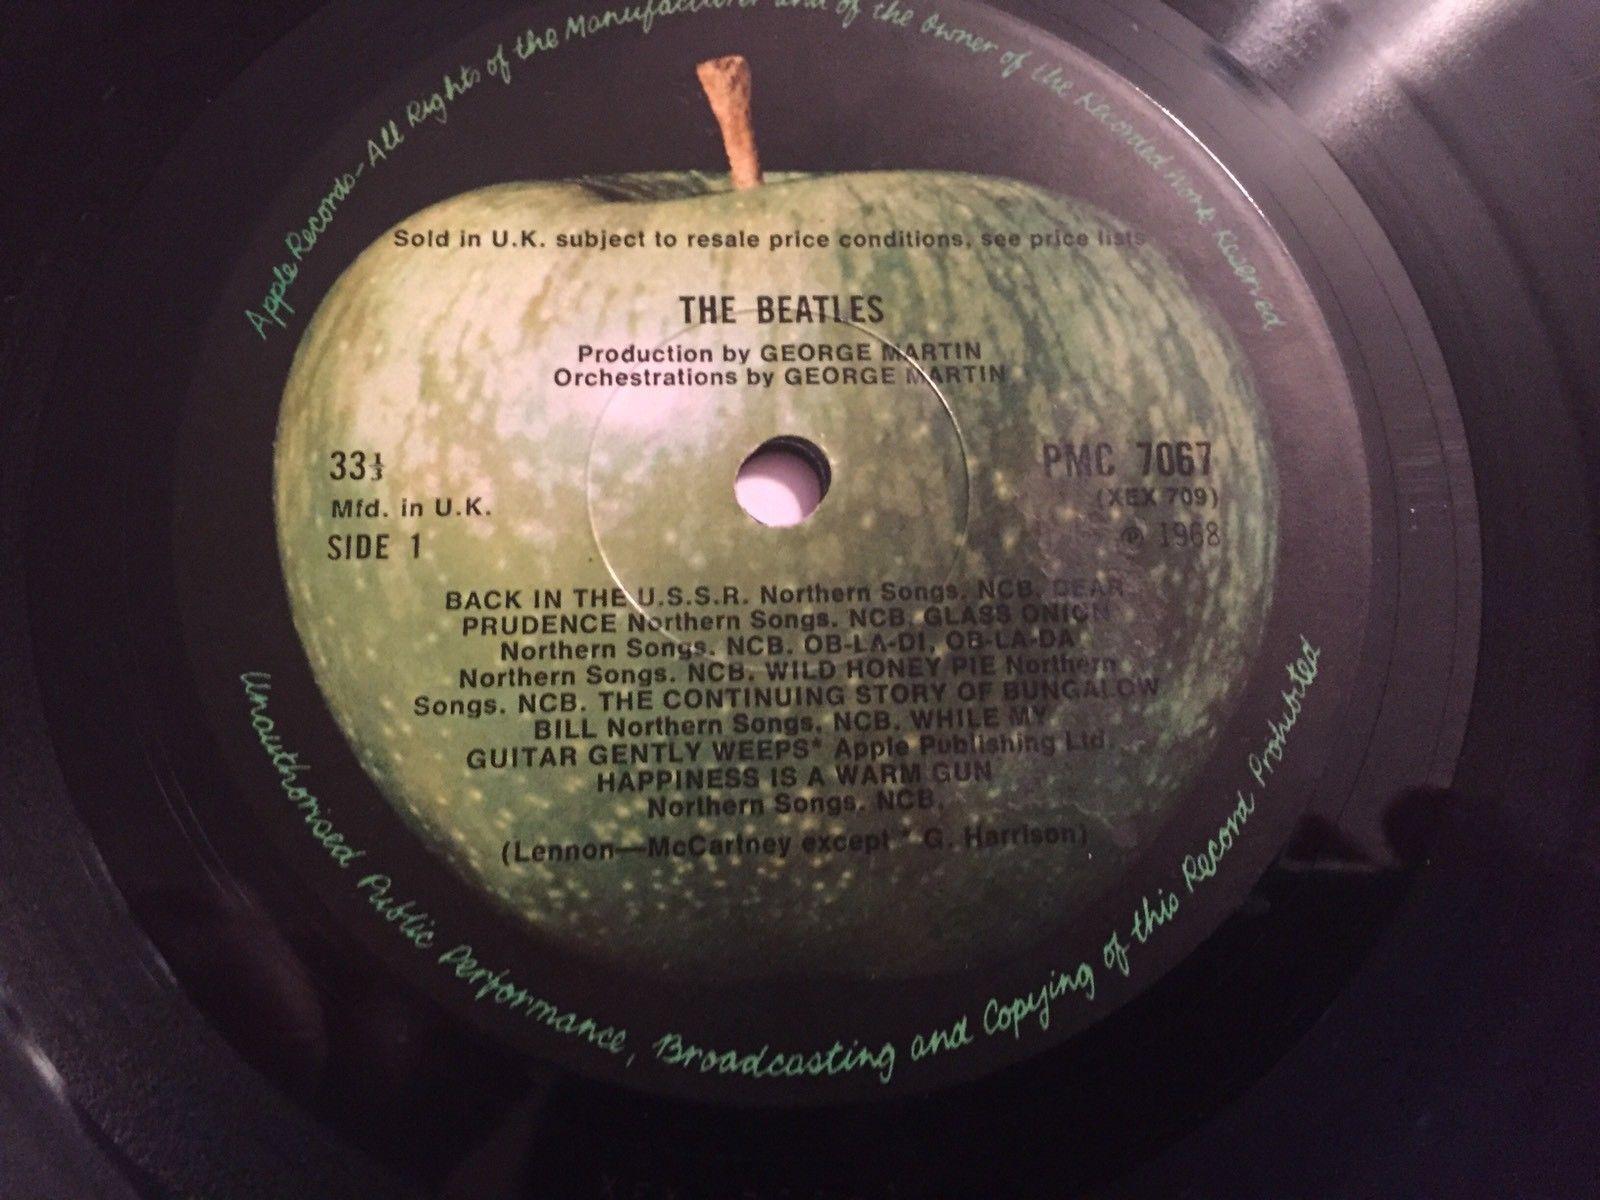 Super Rare Mono Pressing Of The Beatles White Album Up